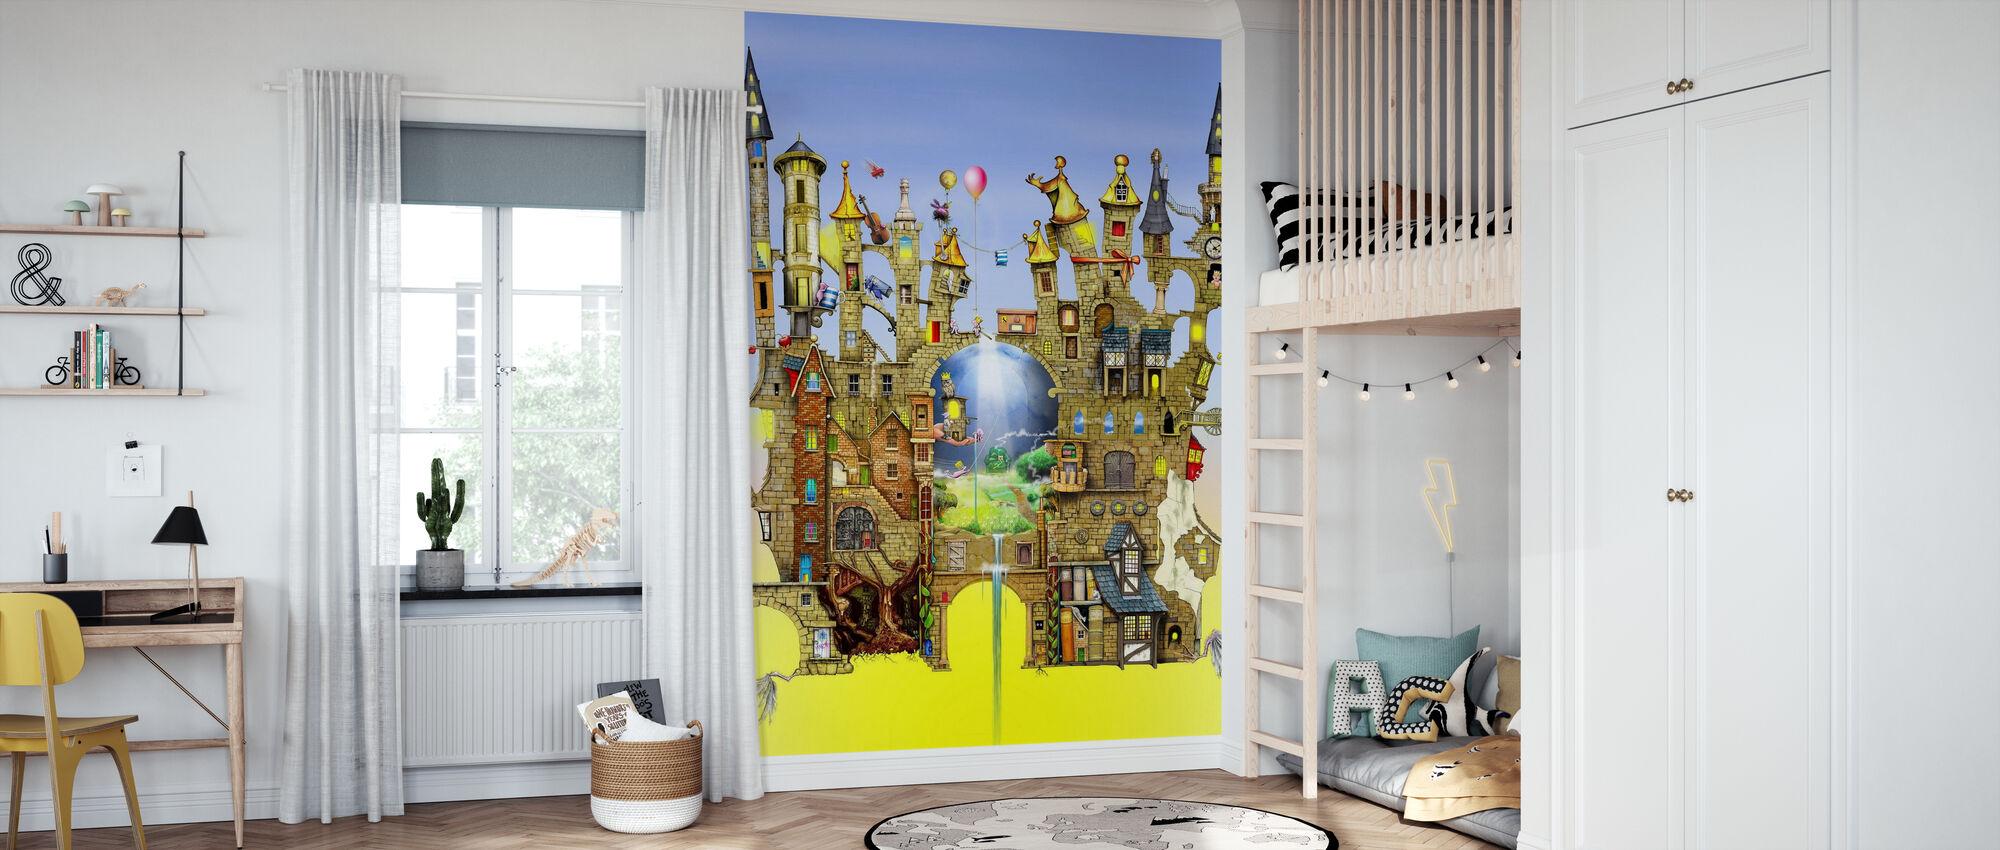 Castles in the Air - Wallpaper - Kids Room